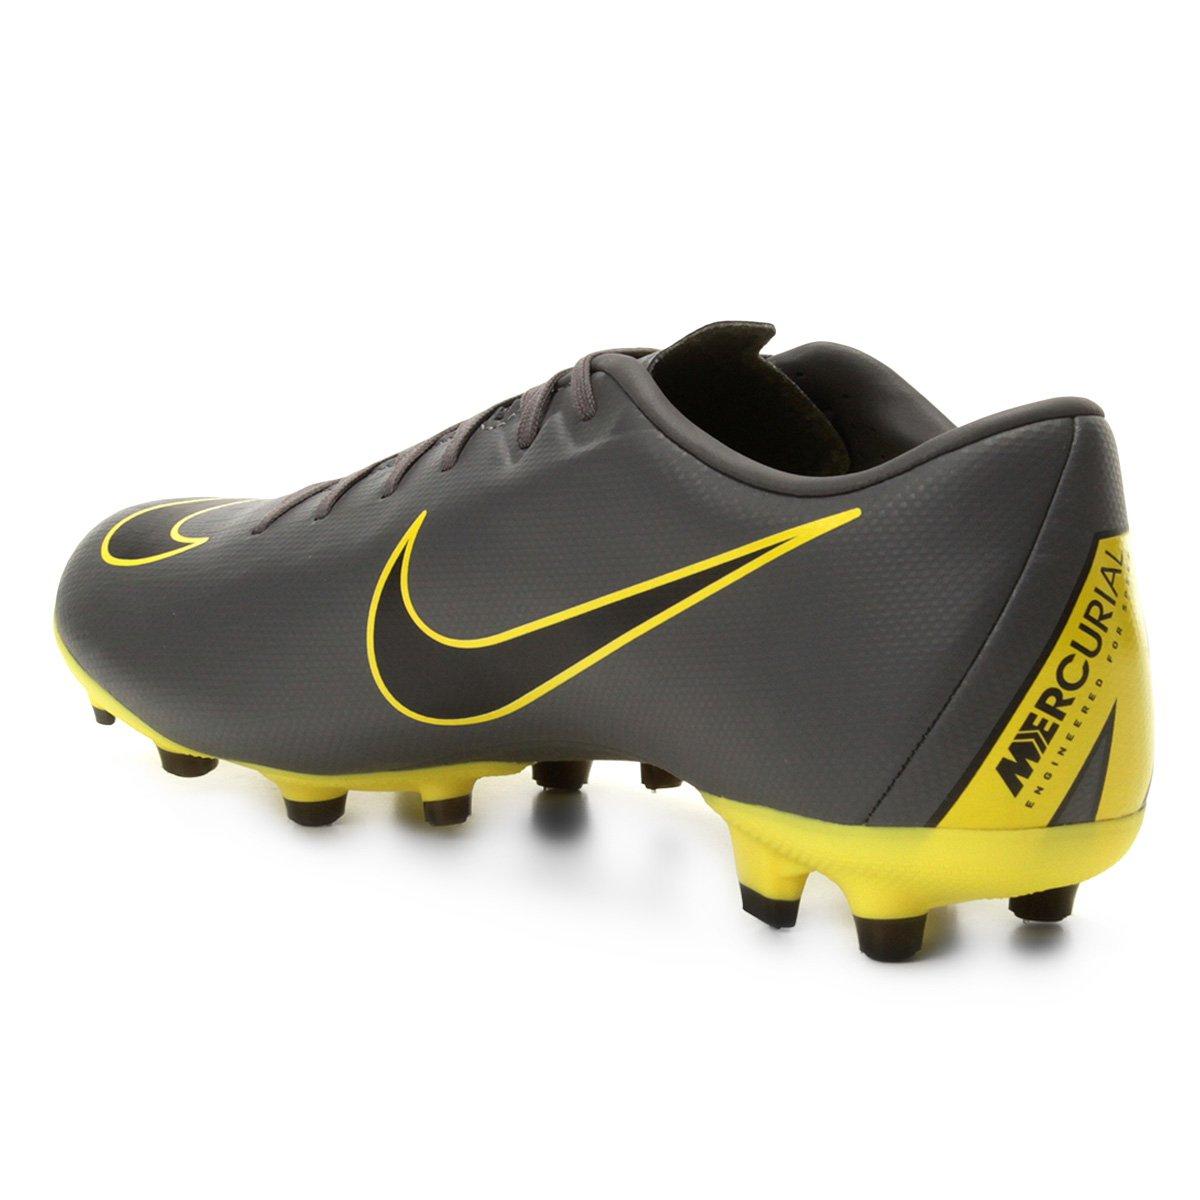 03785c26f1 Chuteira Campo Nike Vapor 12 Academy FG - Cinza e Amarelo - Compre ...